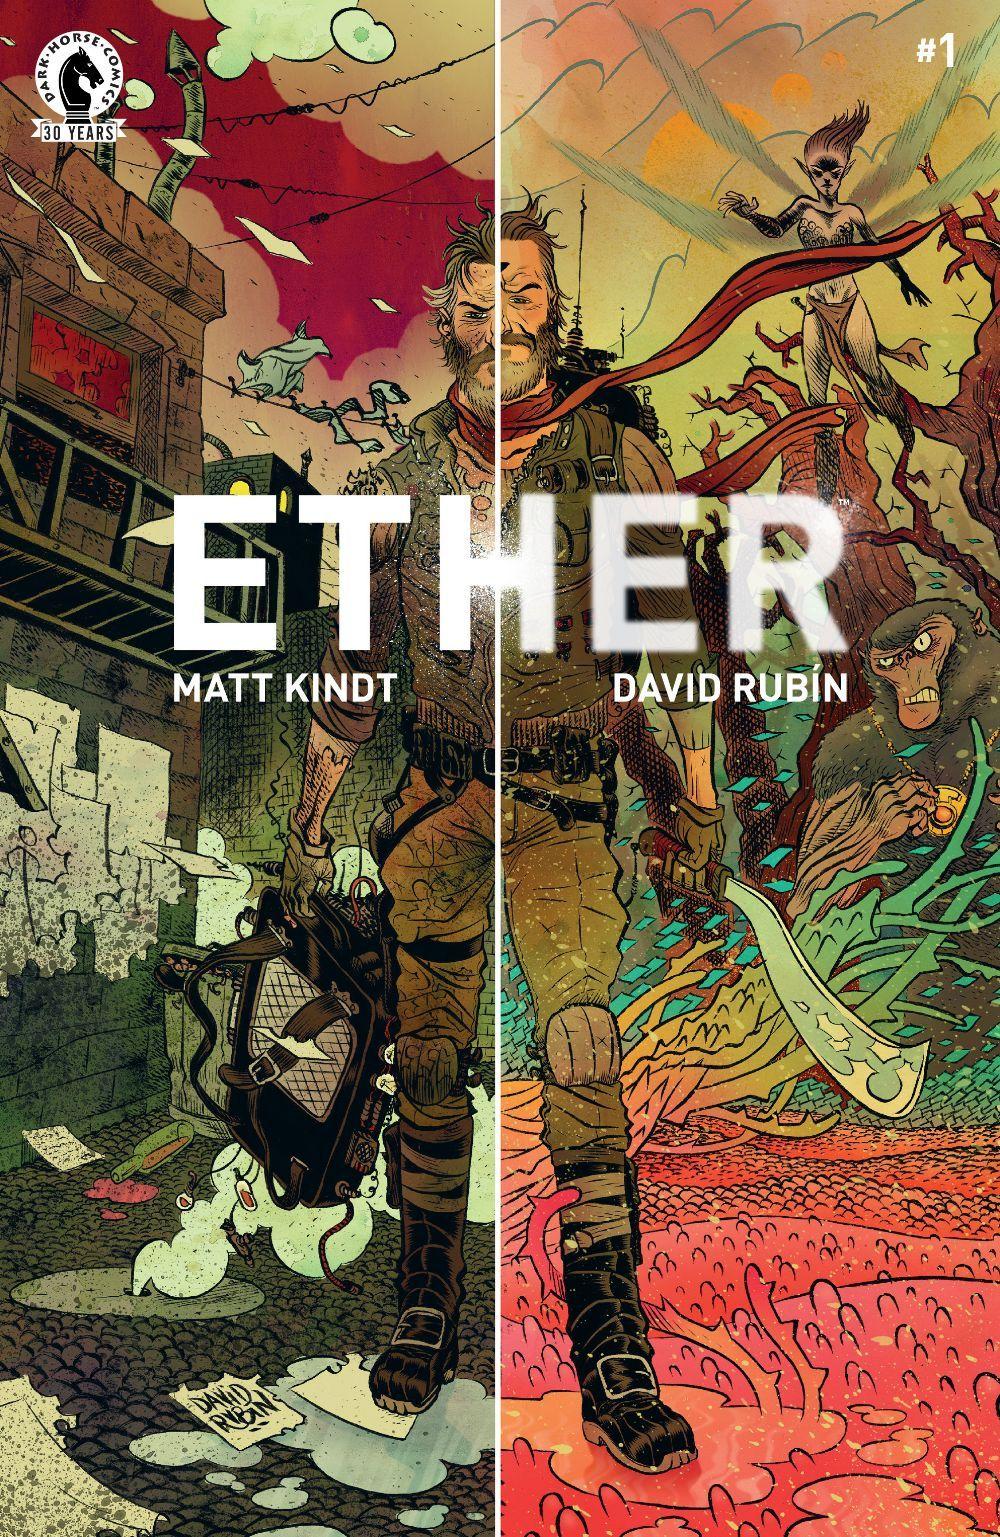 Ether #1 Written by: Matt Kindt Art by: David Rubin 11/15/16